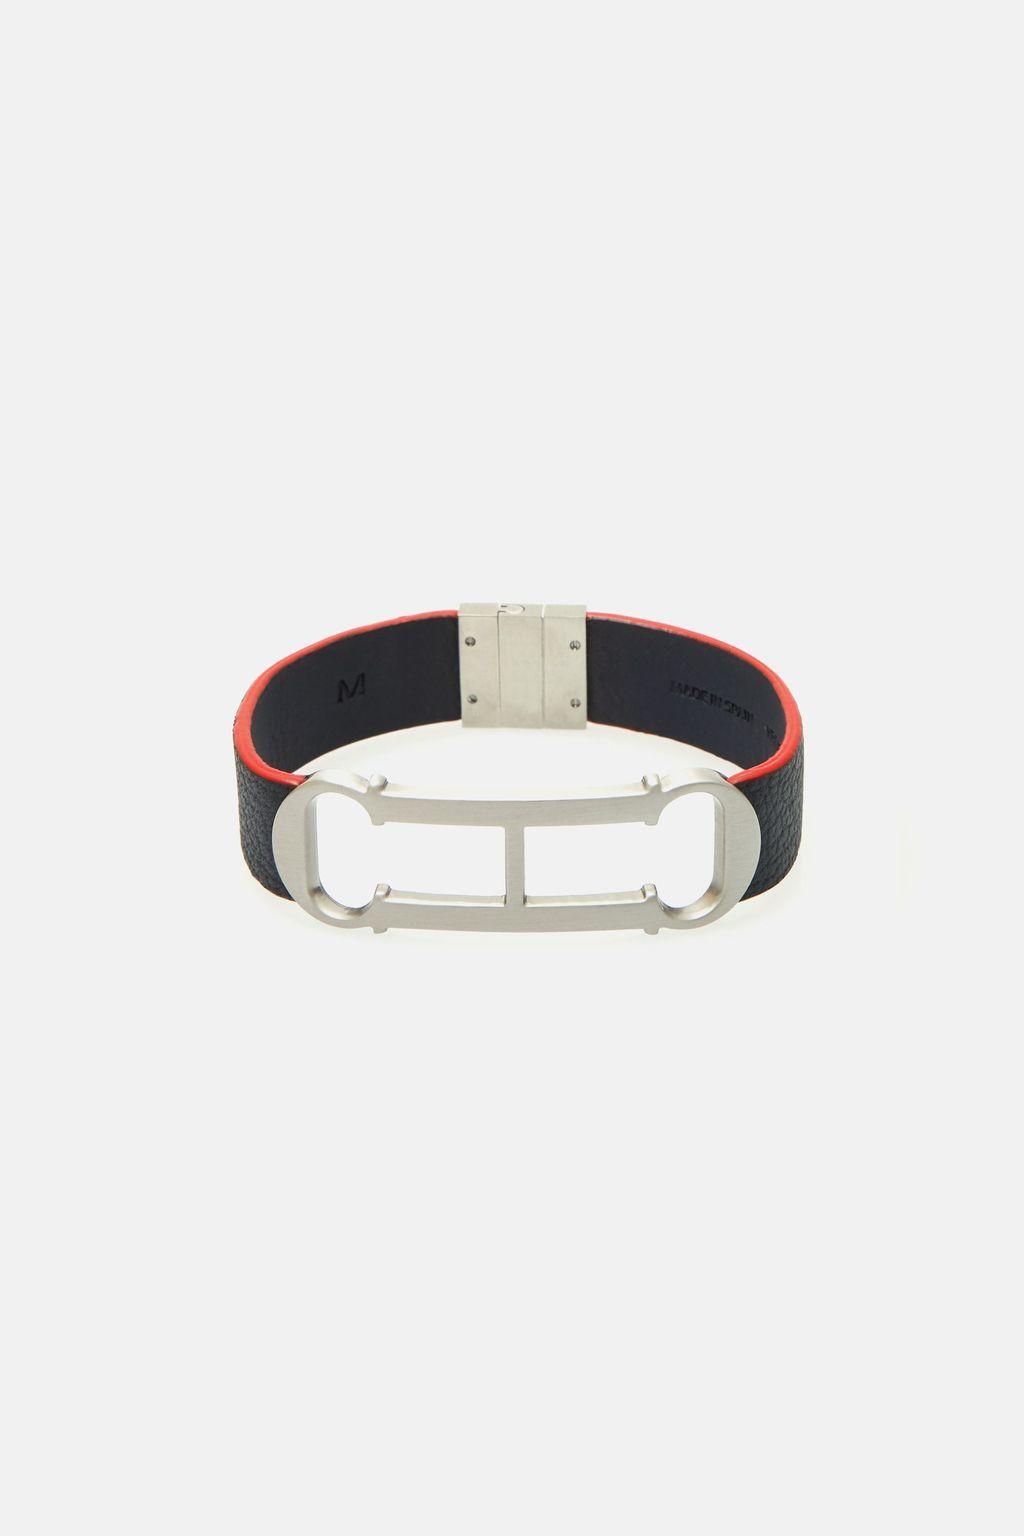 Initials Magnet bracelet